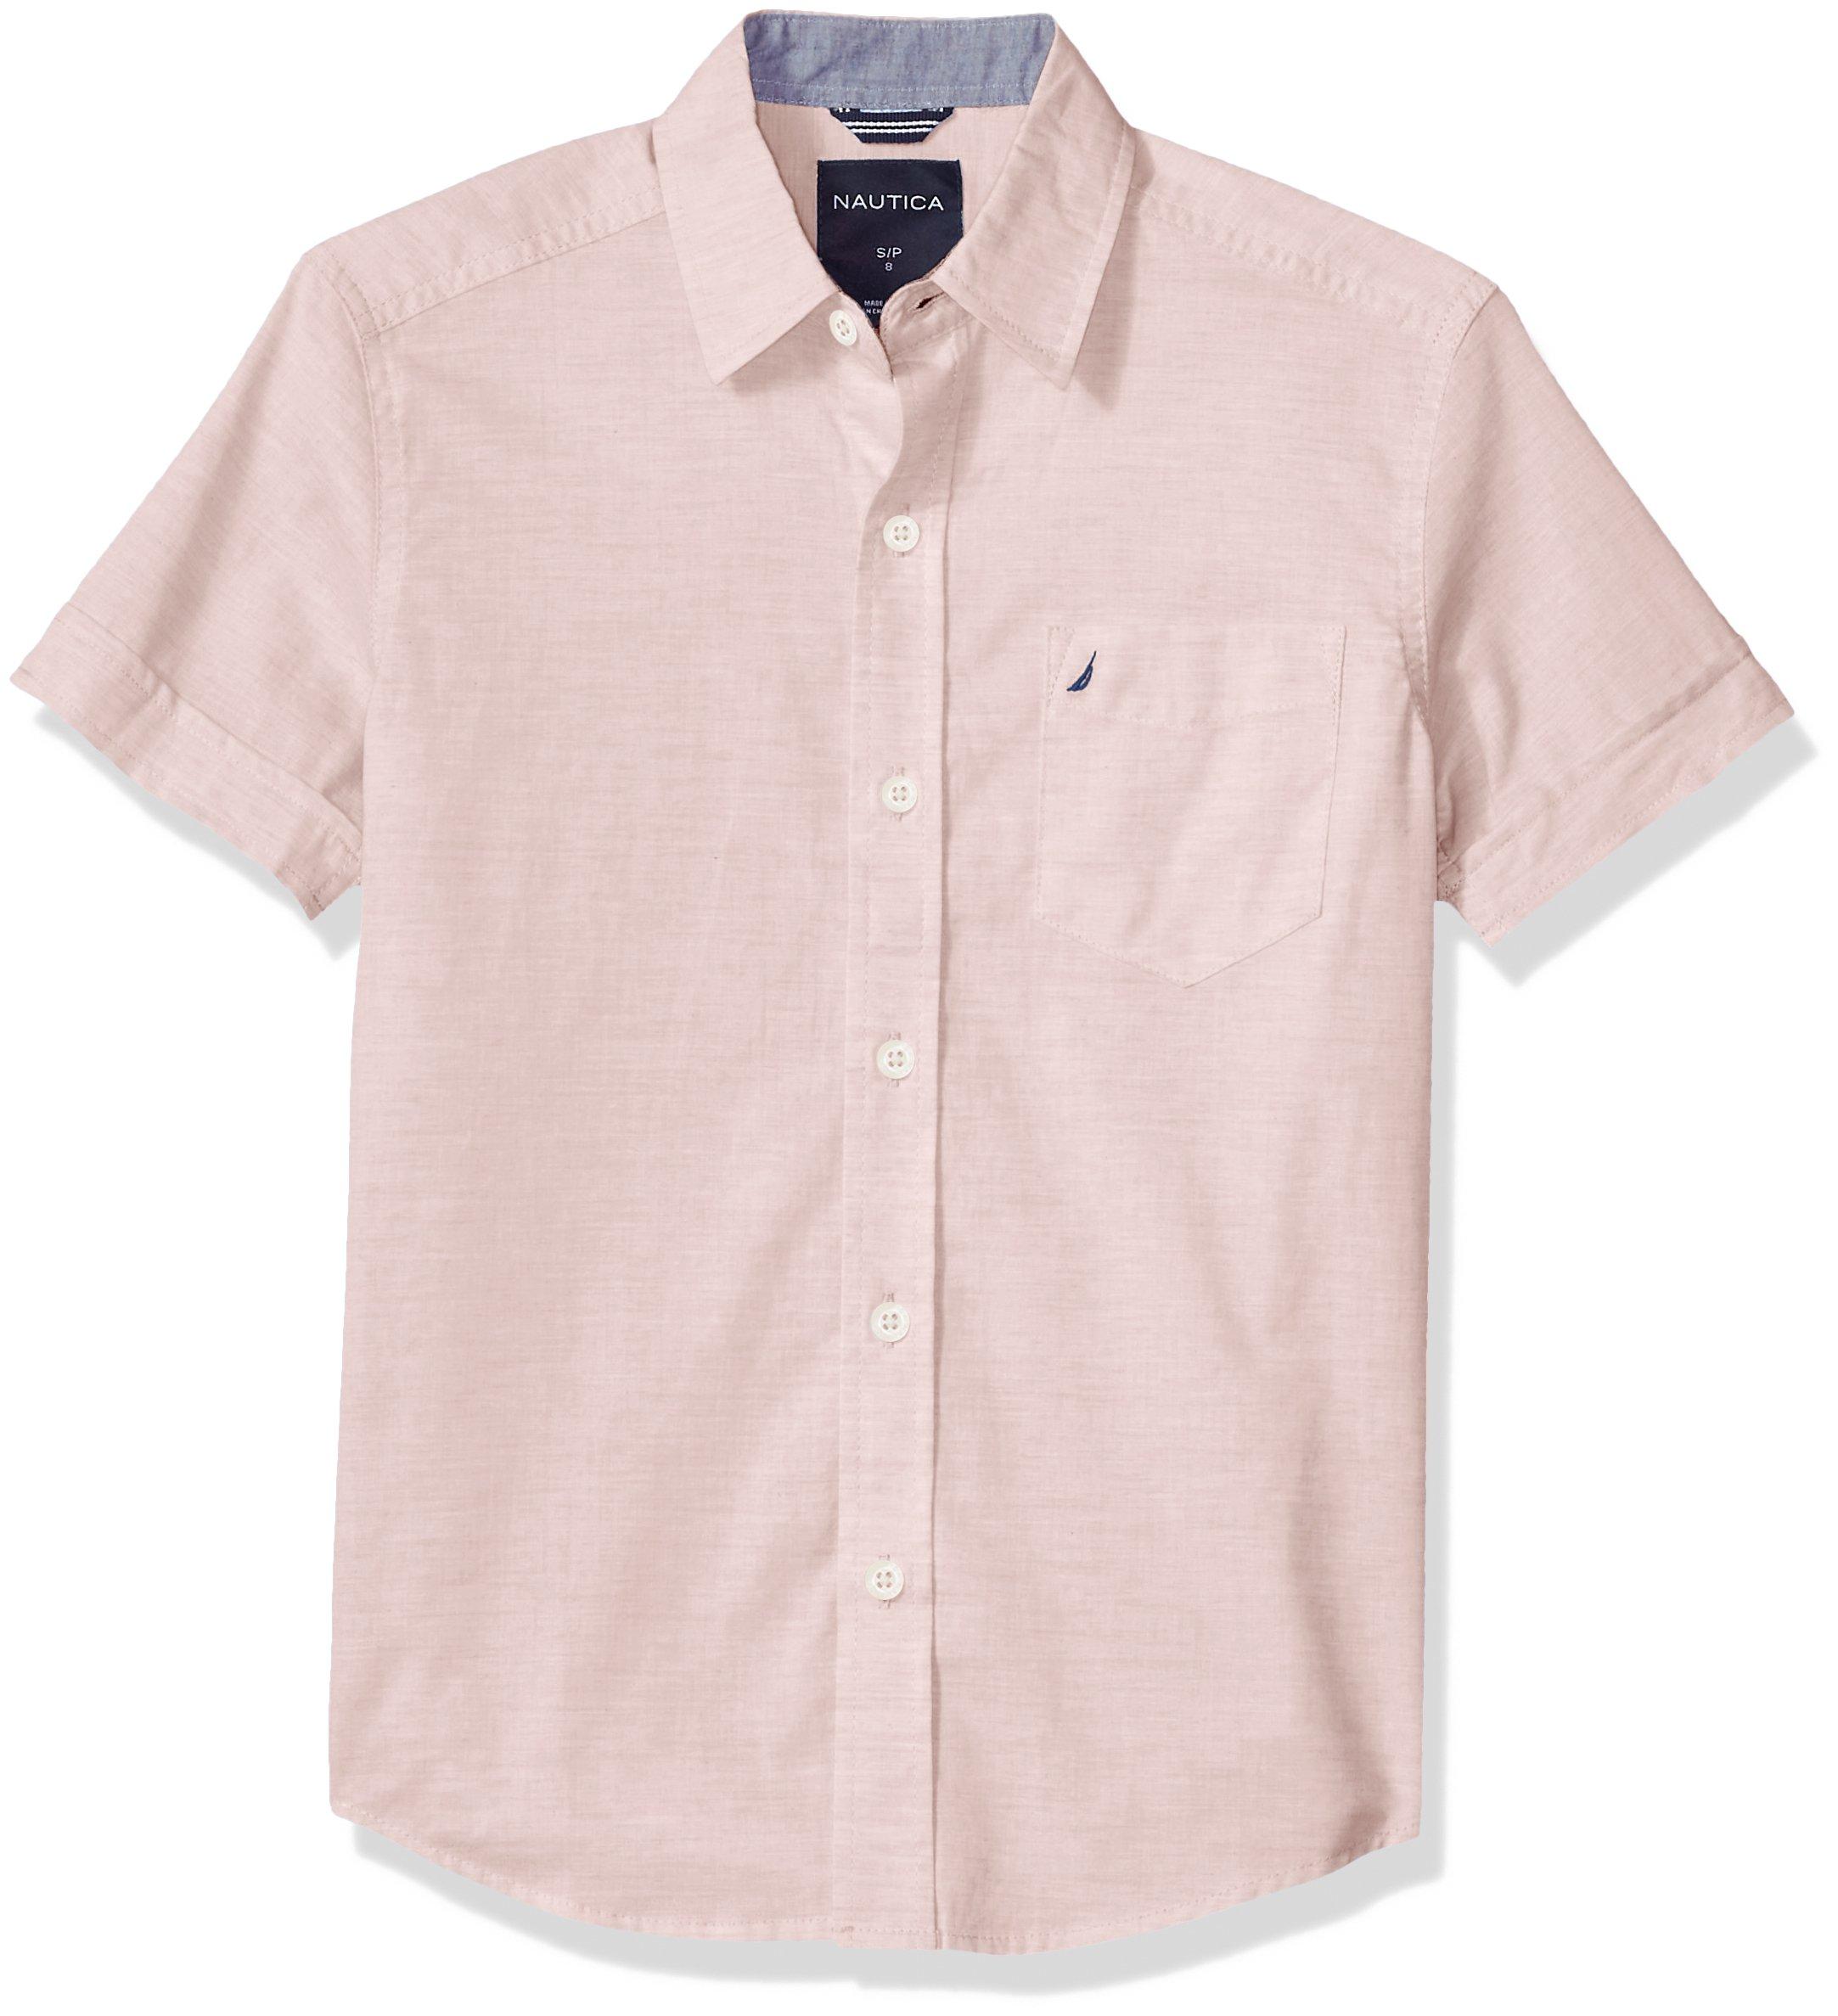 Nautica Boys' Little Short Sleeve Poplin Shirt, Sunair Peach, 5/6